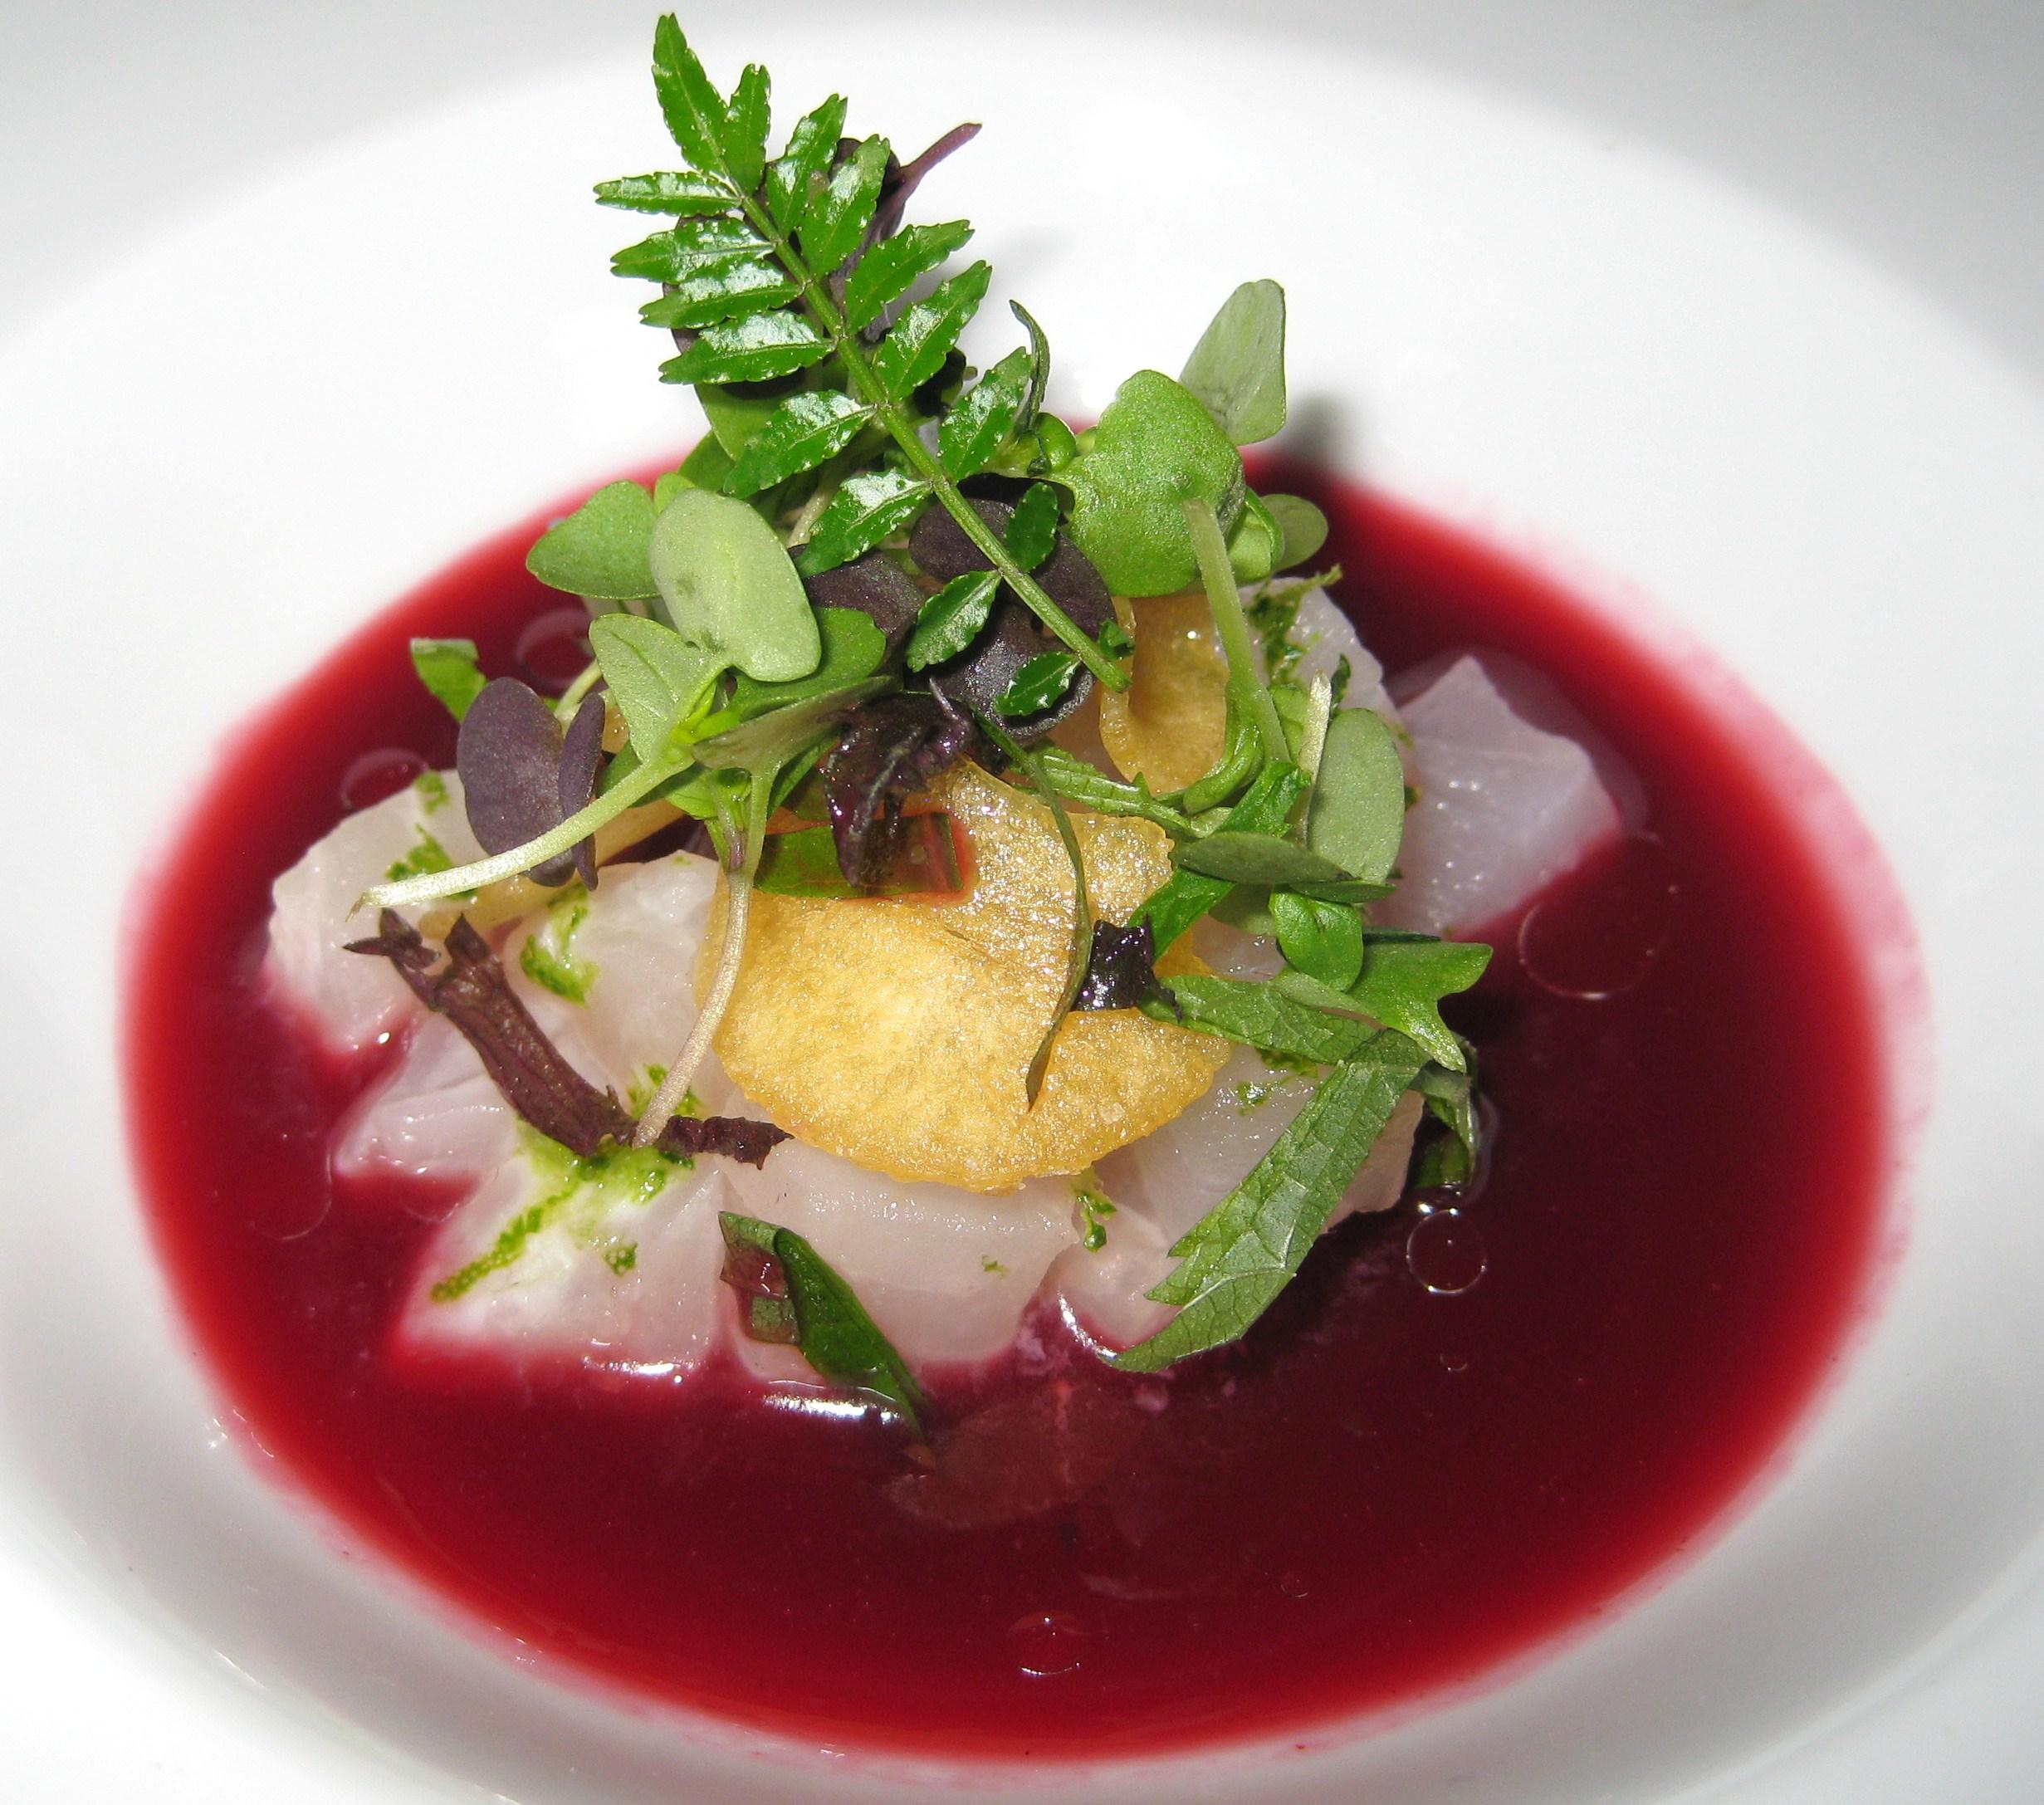 Chef Laurent Gras's diced kinmedai seasoned with sudachi lime juice